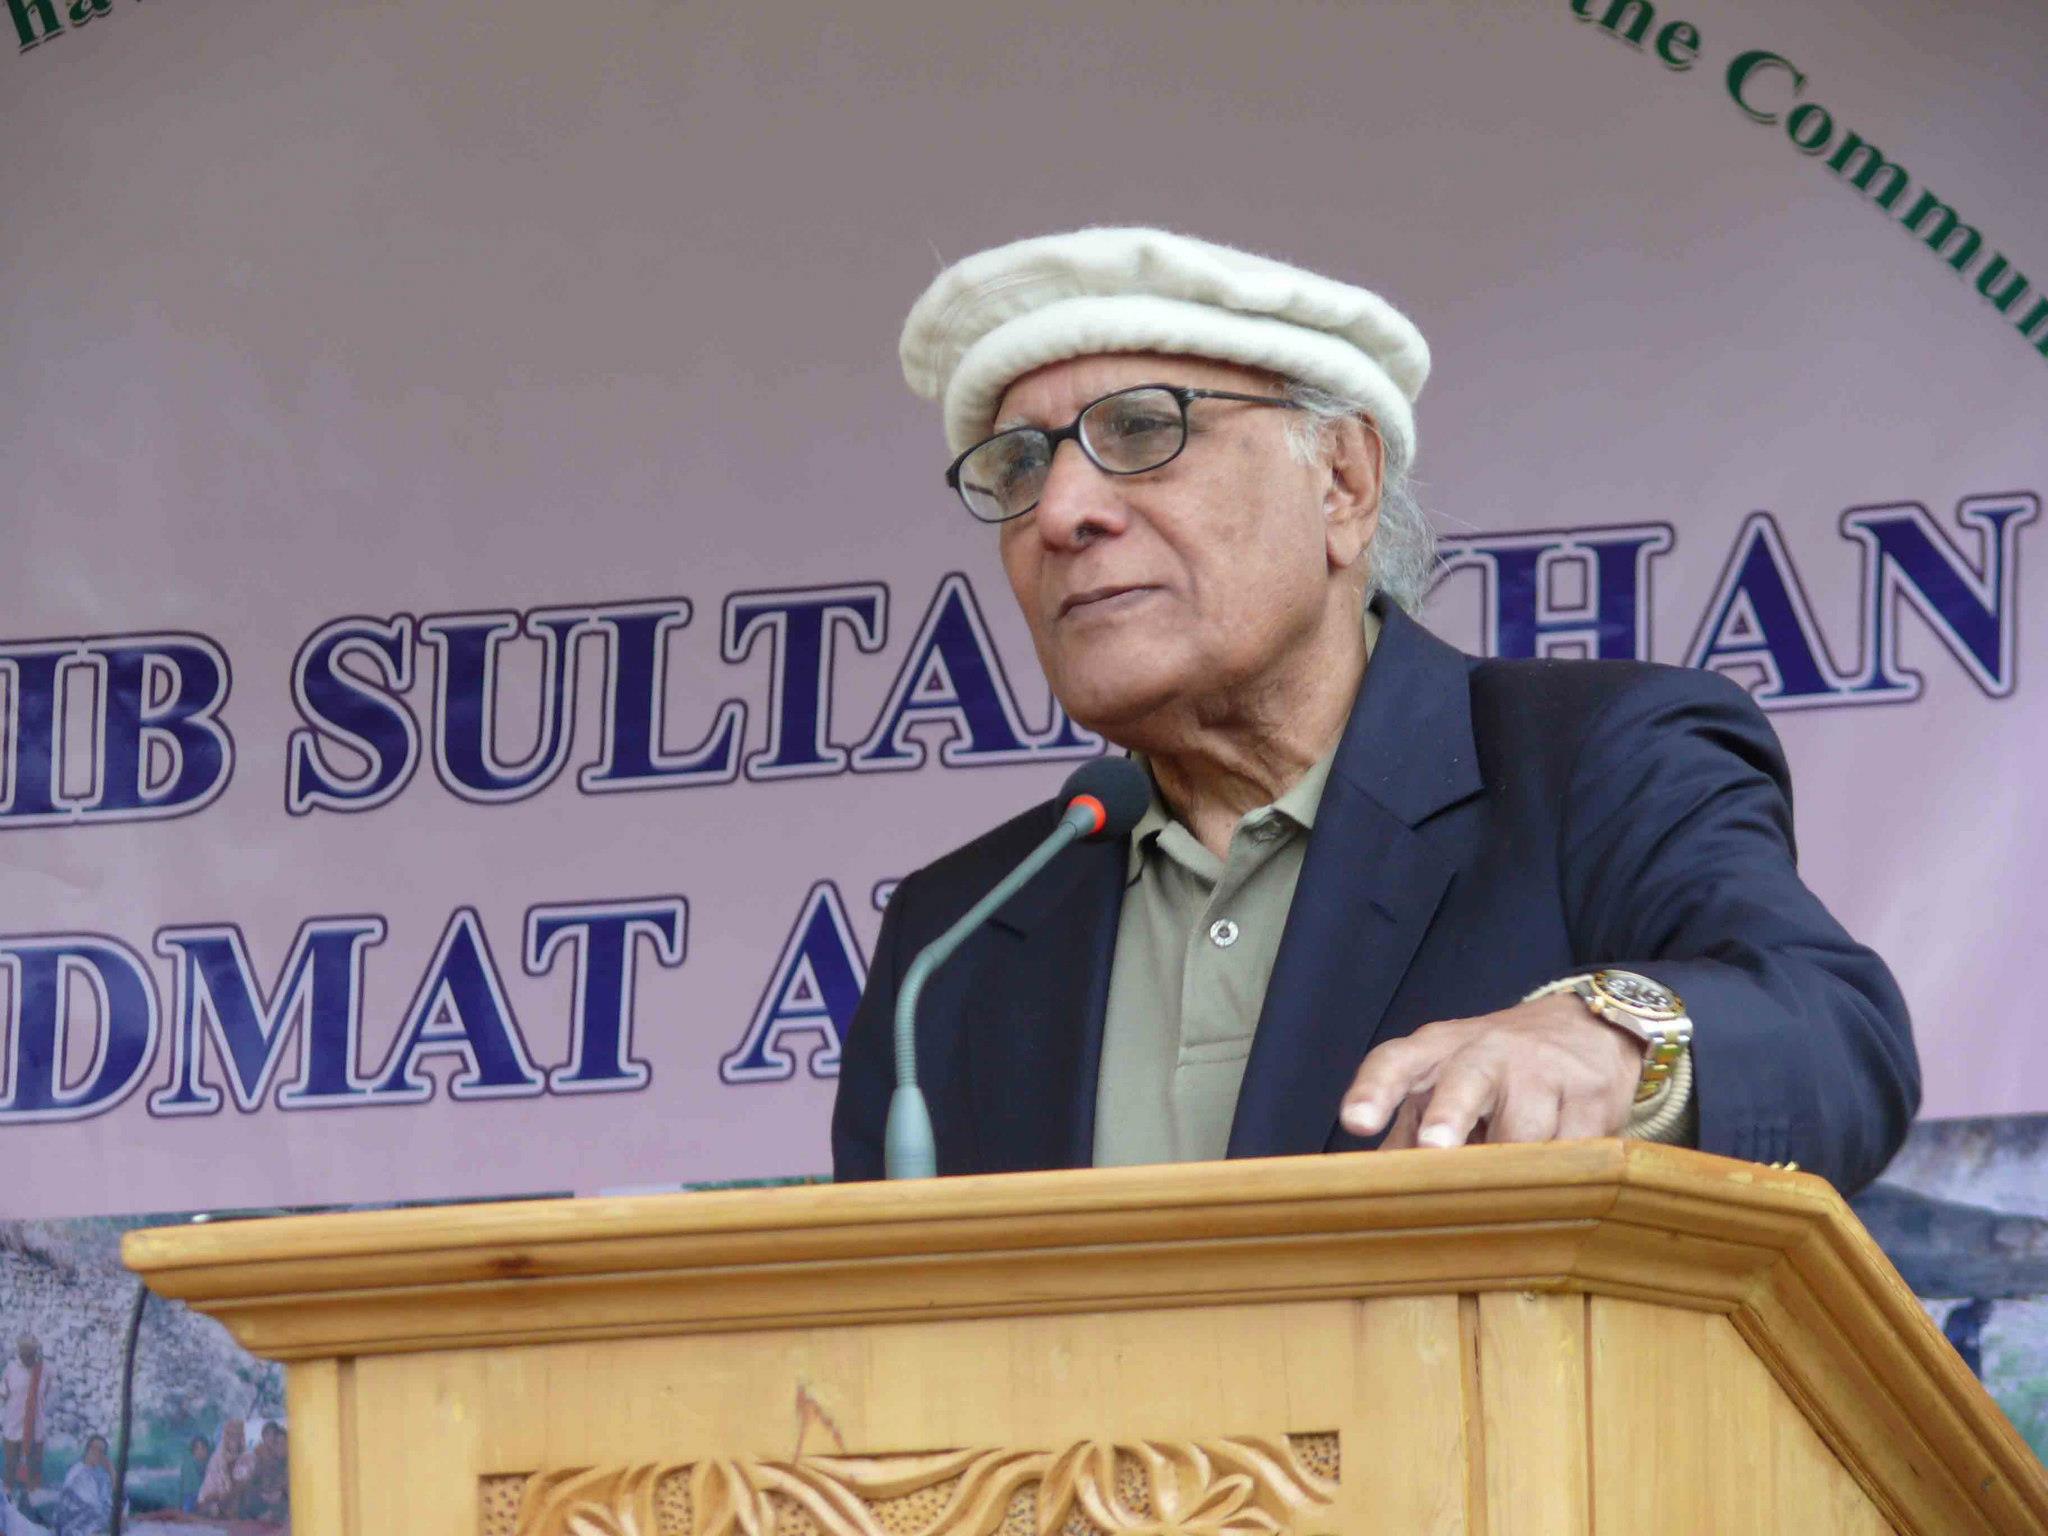 Shoaib Sultan Khidmat Award presented to local leaders